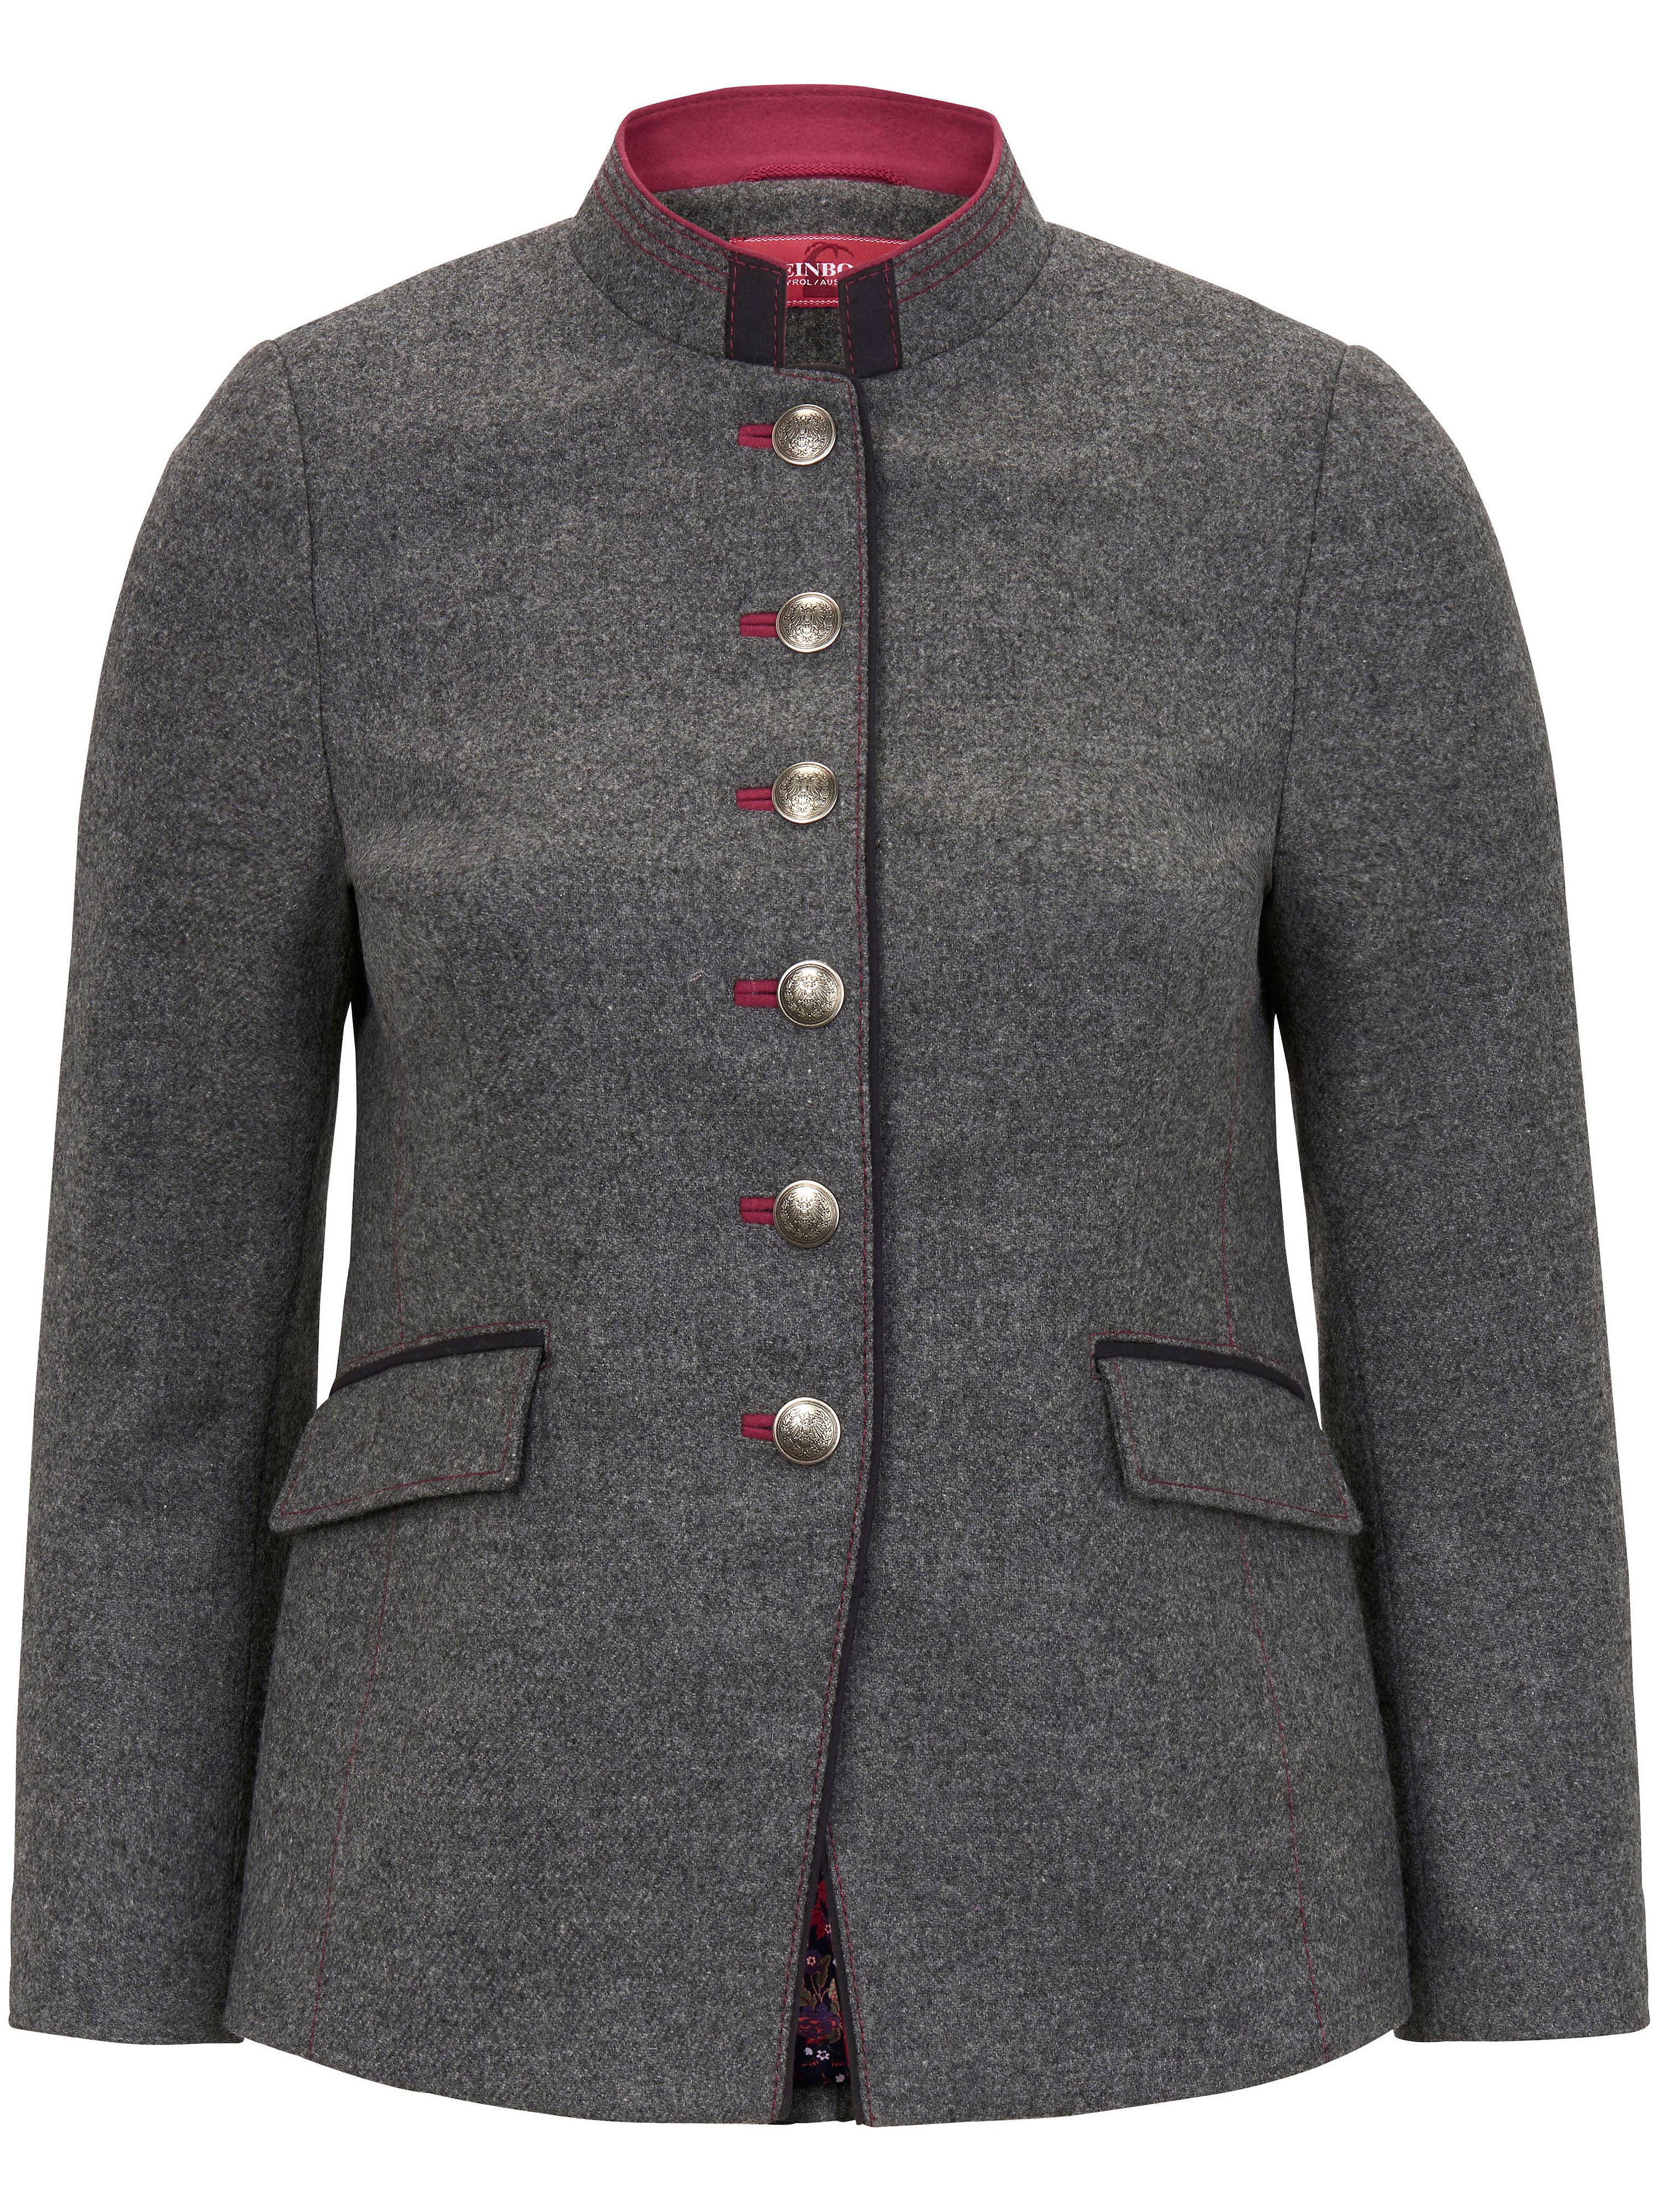 Image of   Jakke 100% ren ny uld Fra Steinbock grå